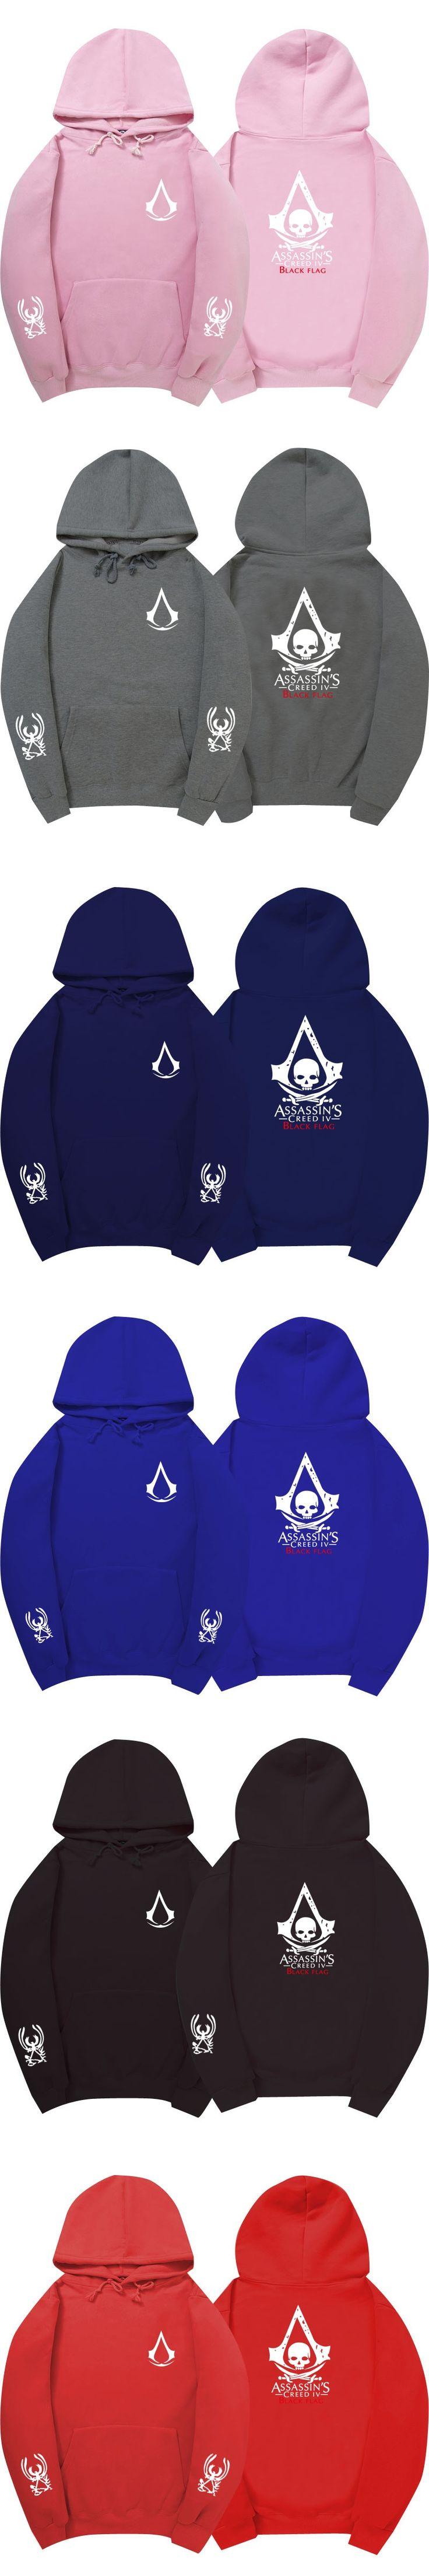 hoodies men 2017 Winter Assasins Creed Hoodie Black Cosplay Sweatshirt Costume Fleece Lined Assassins Creed hoodies sweatshirt